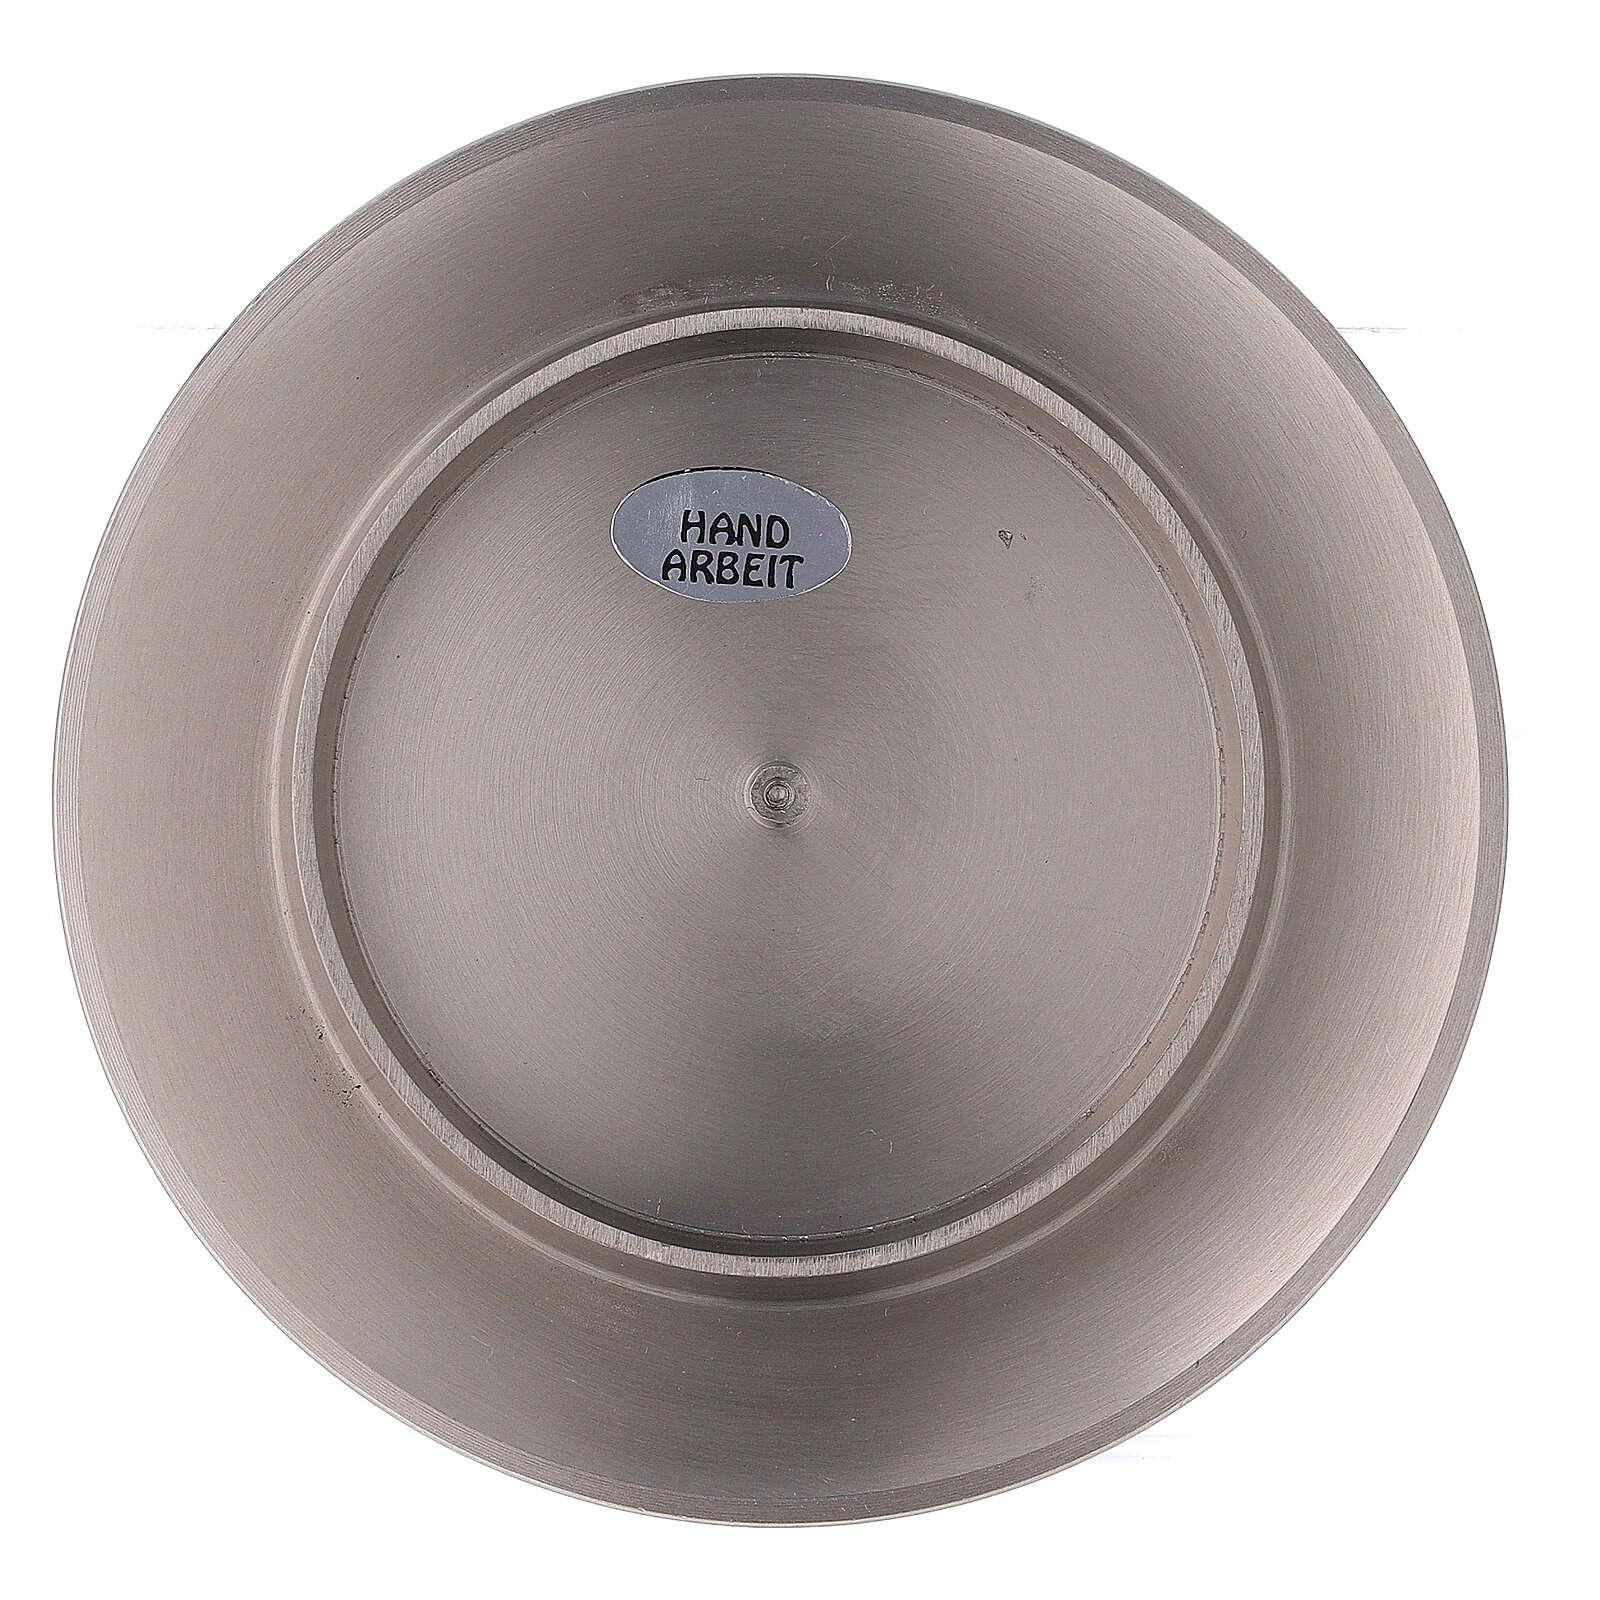 Bougeoir circulaire laiton nickelé satiné 8 cm 3